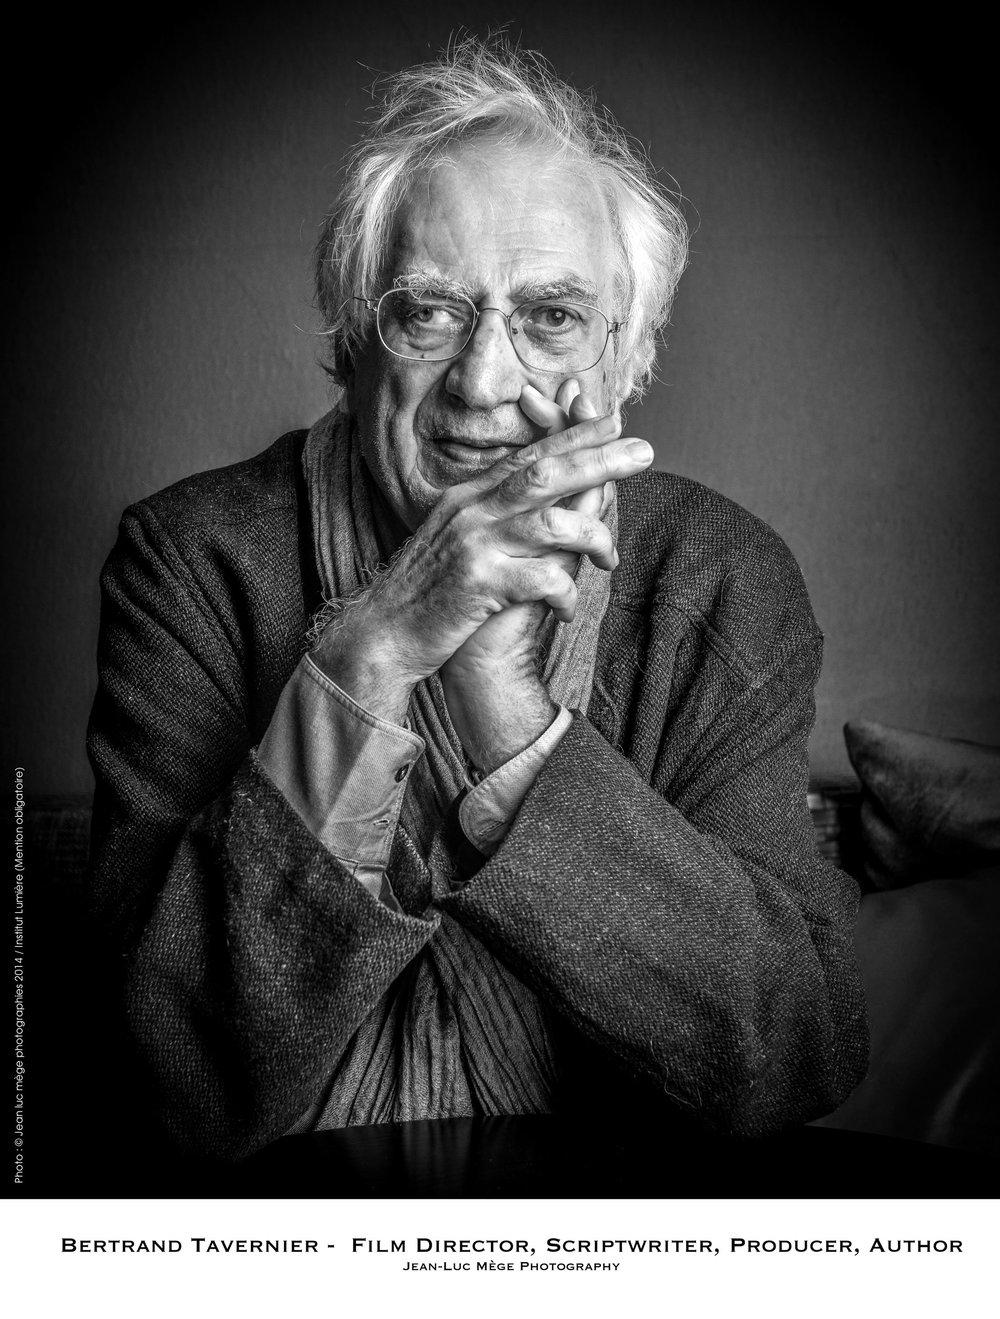 Bertrand Tavernier©jeanluc mege-7783 - copie.jpg